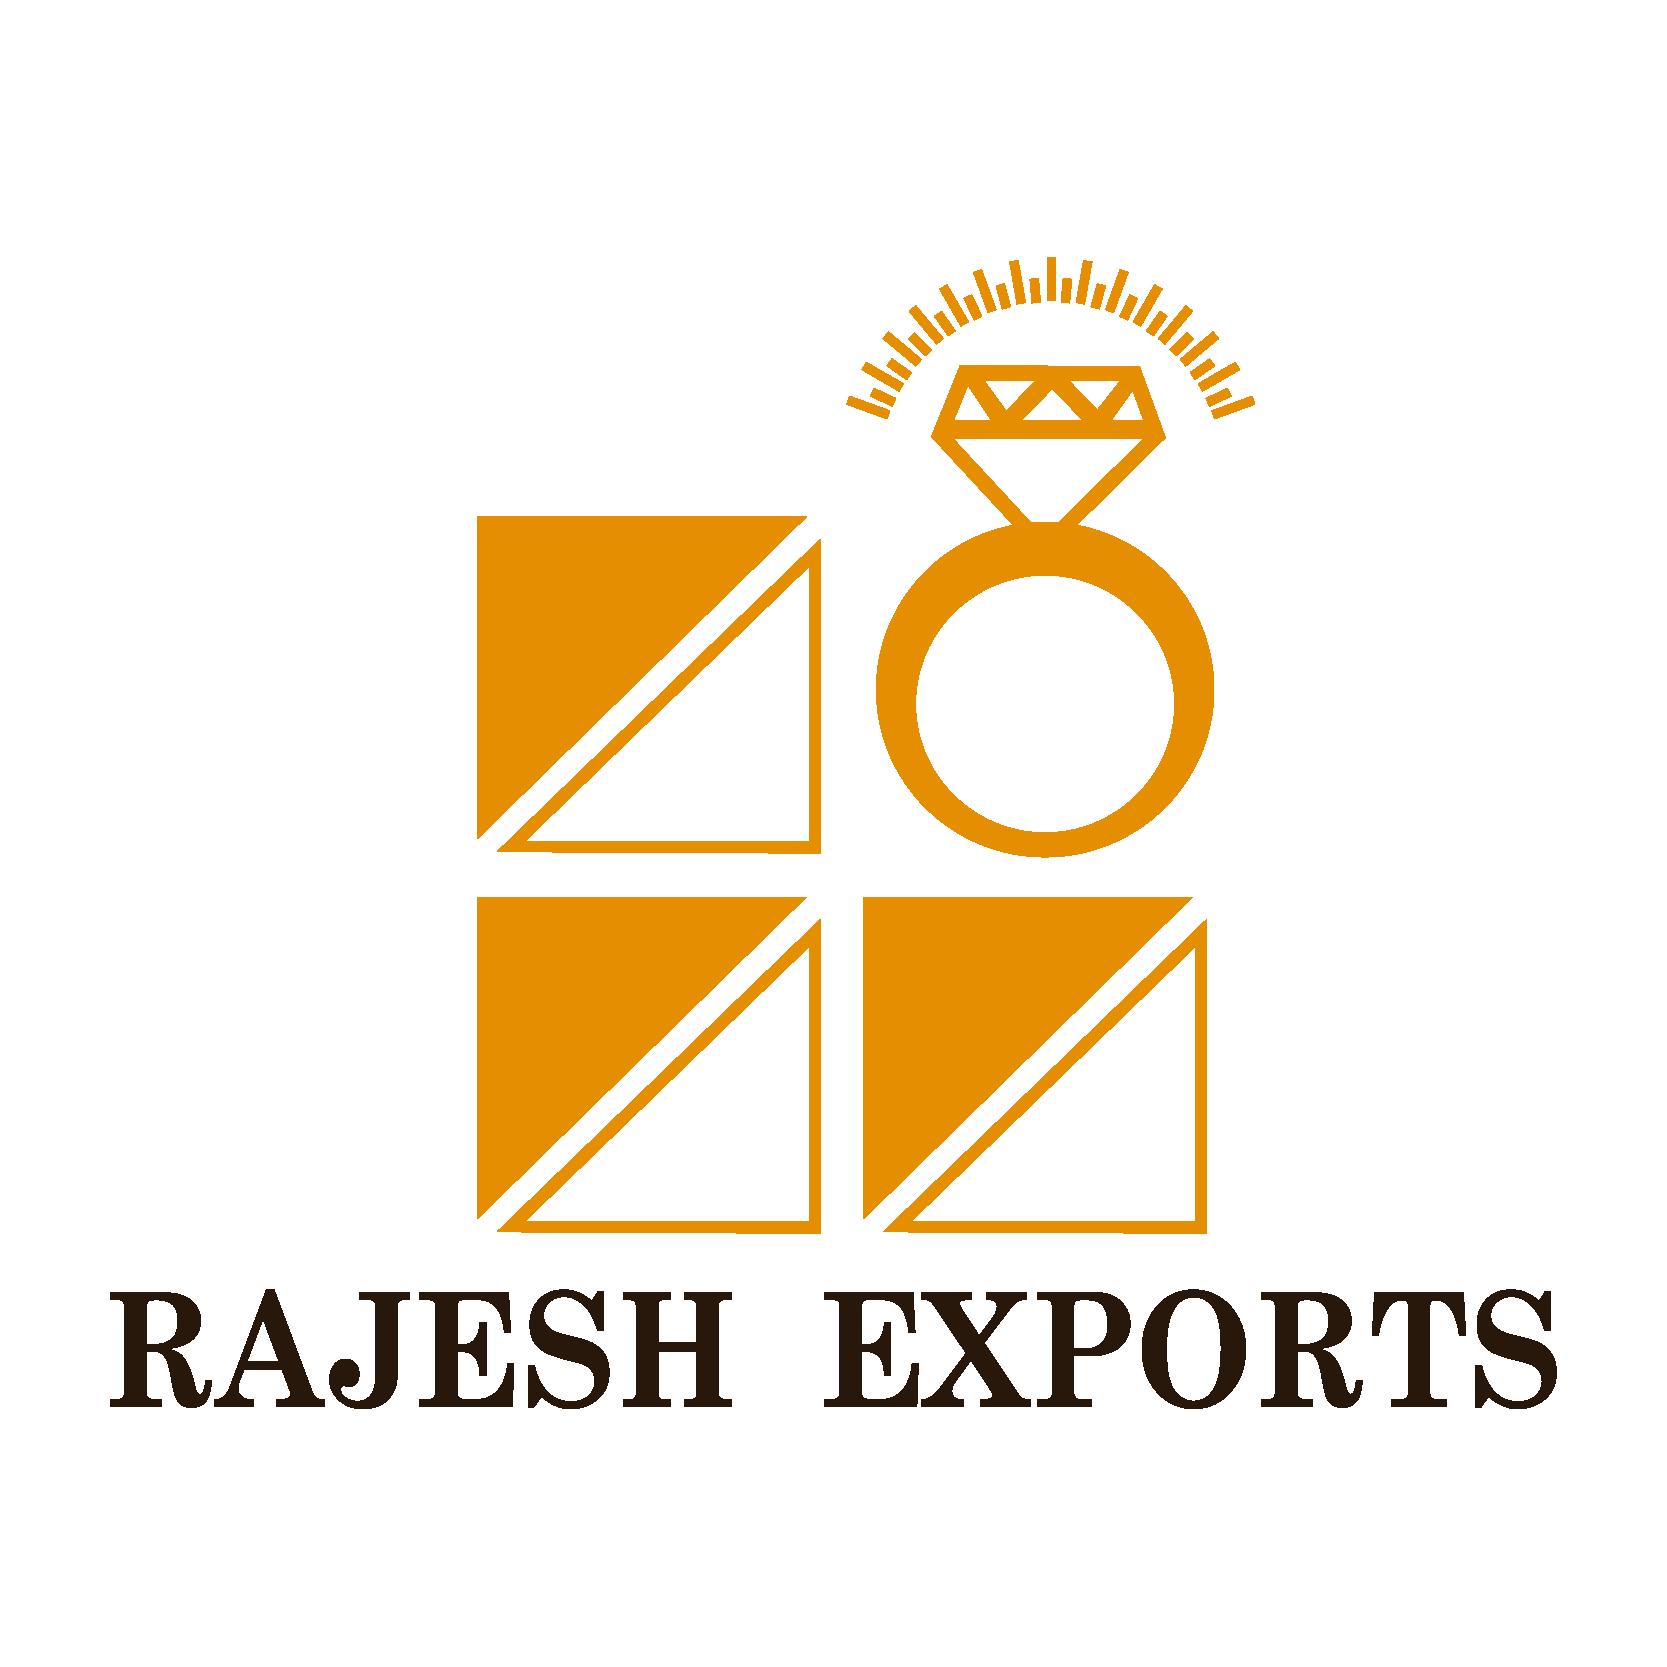 Rajesh Exports Logo png